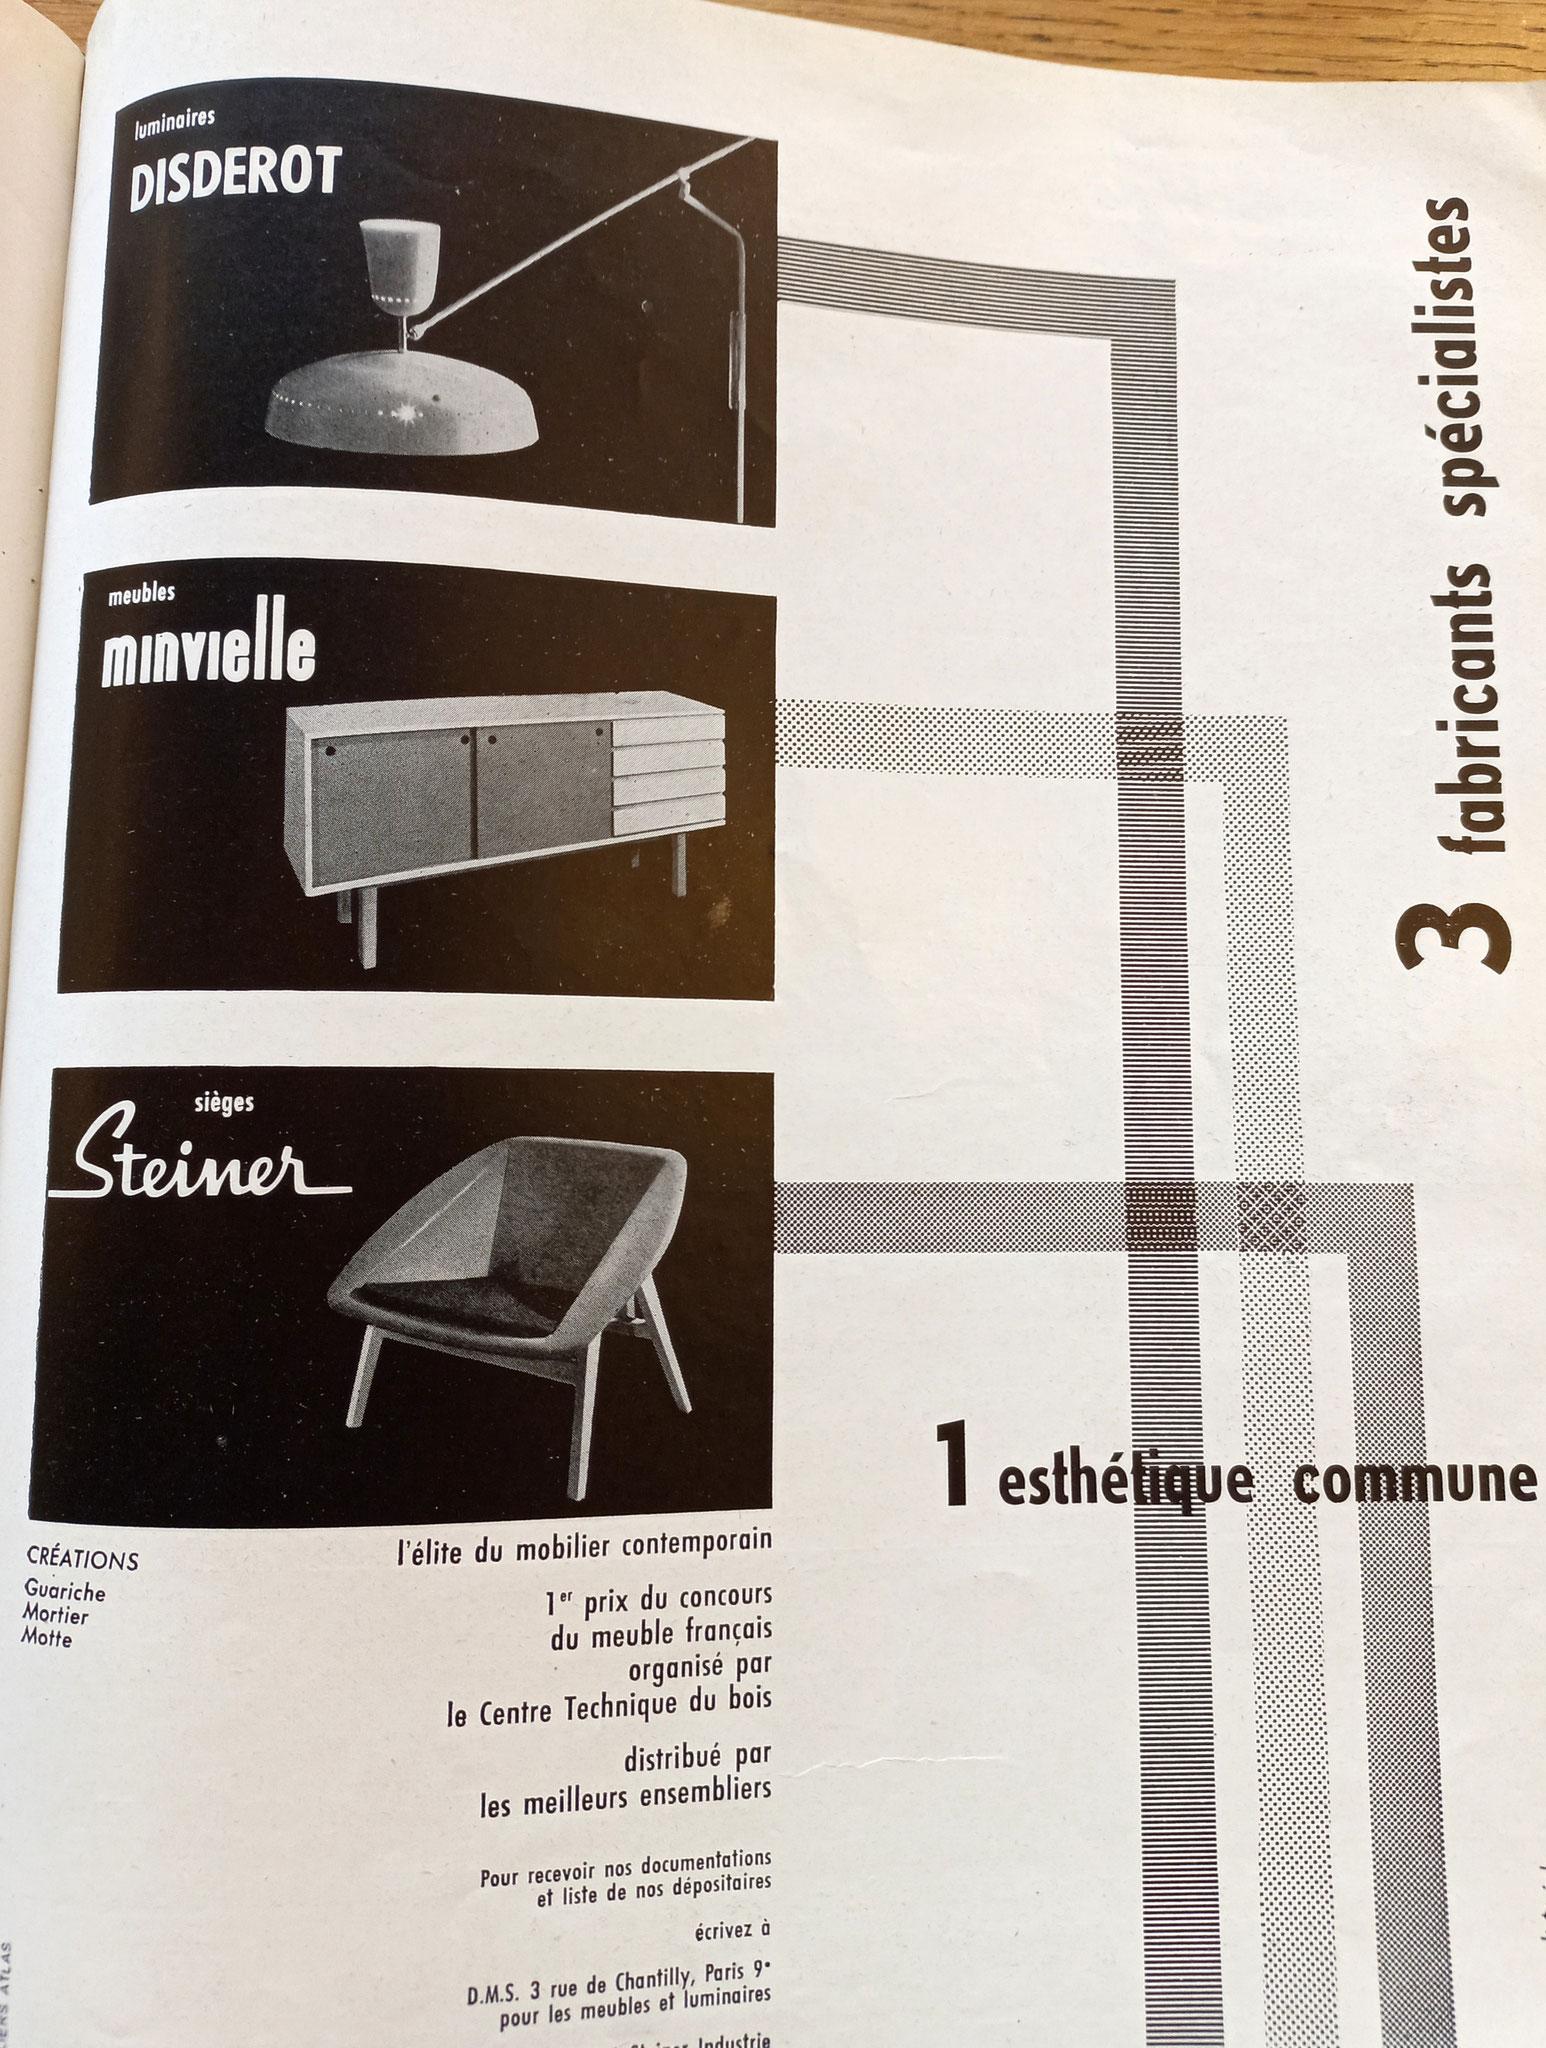 Publicité Disderot/ Minvielle/ Steiner, c. 1955